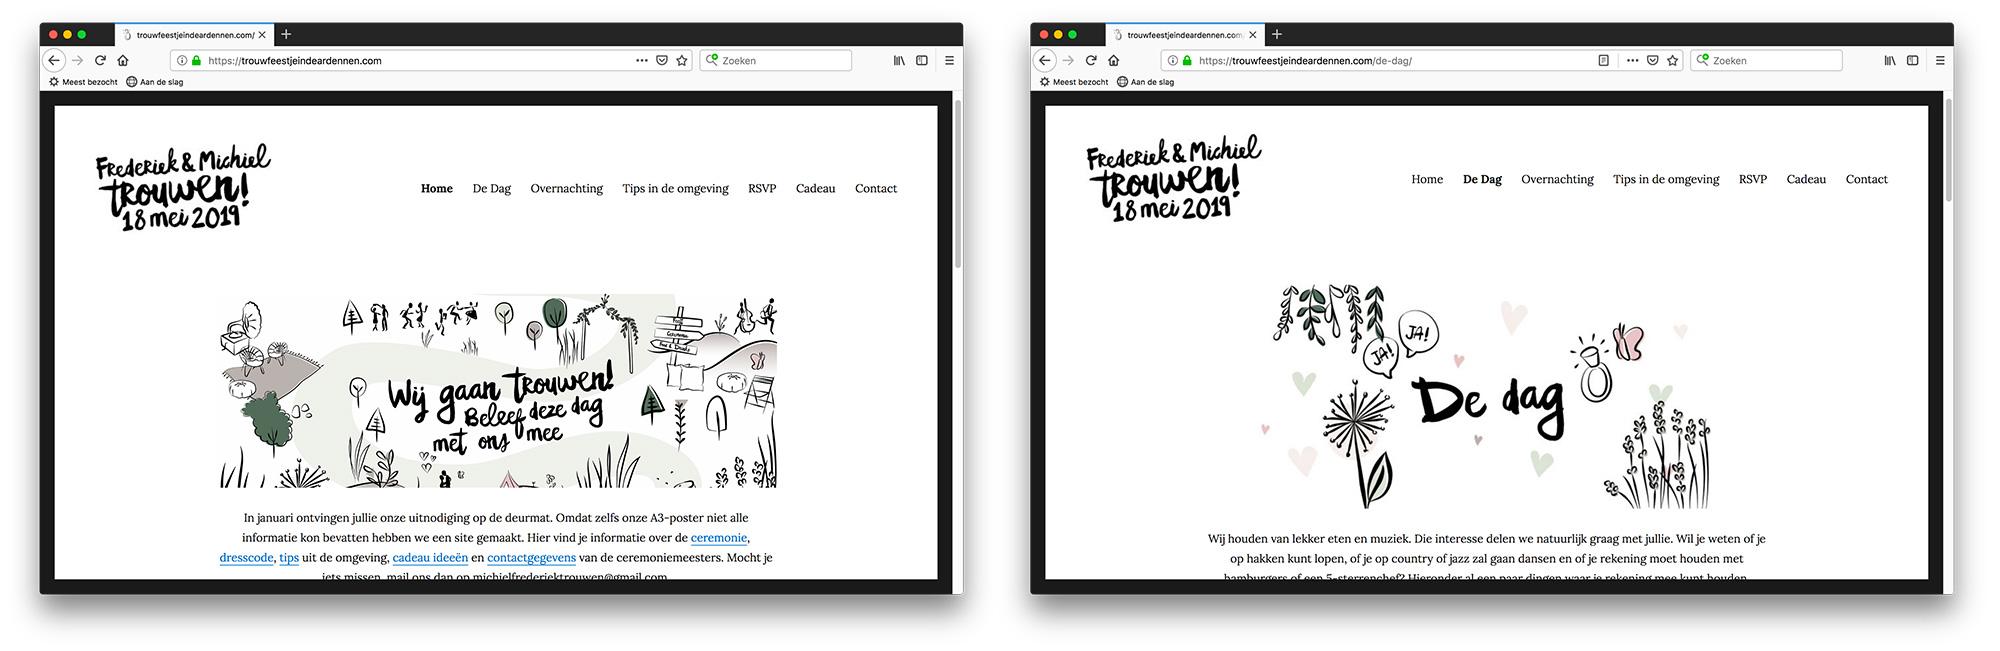 FMwebsite1.jpg